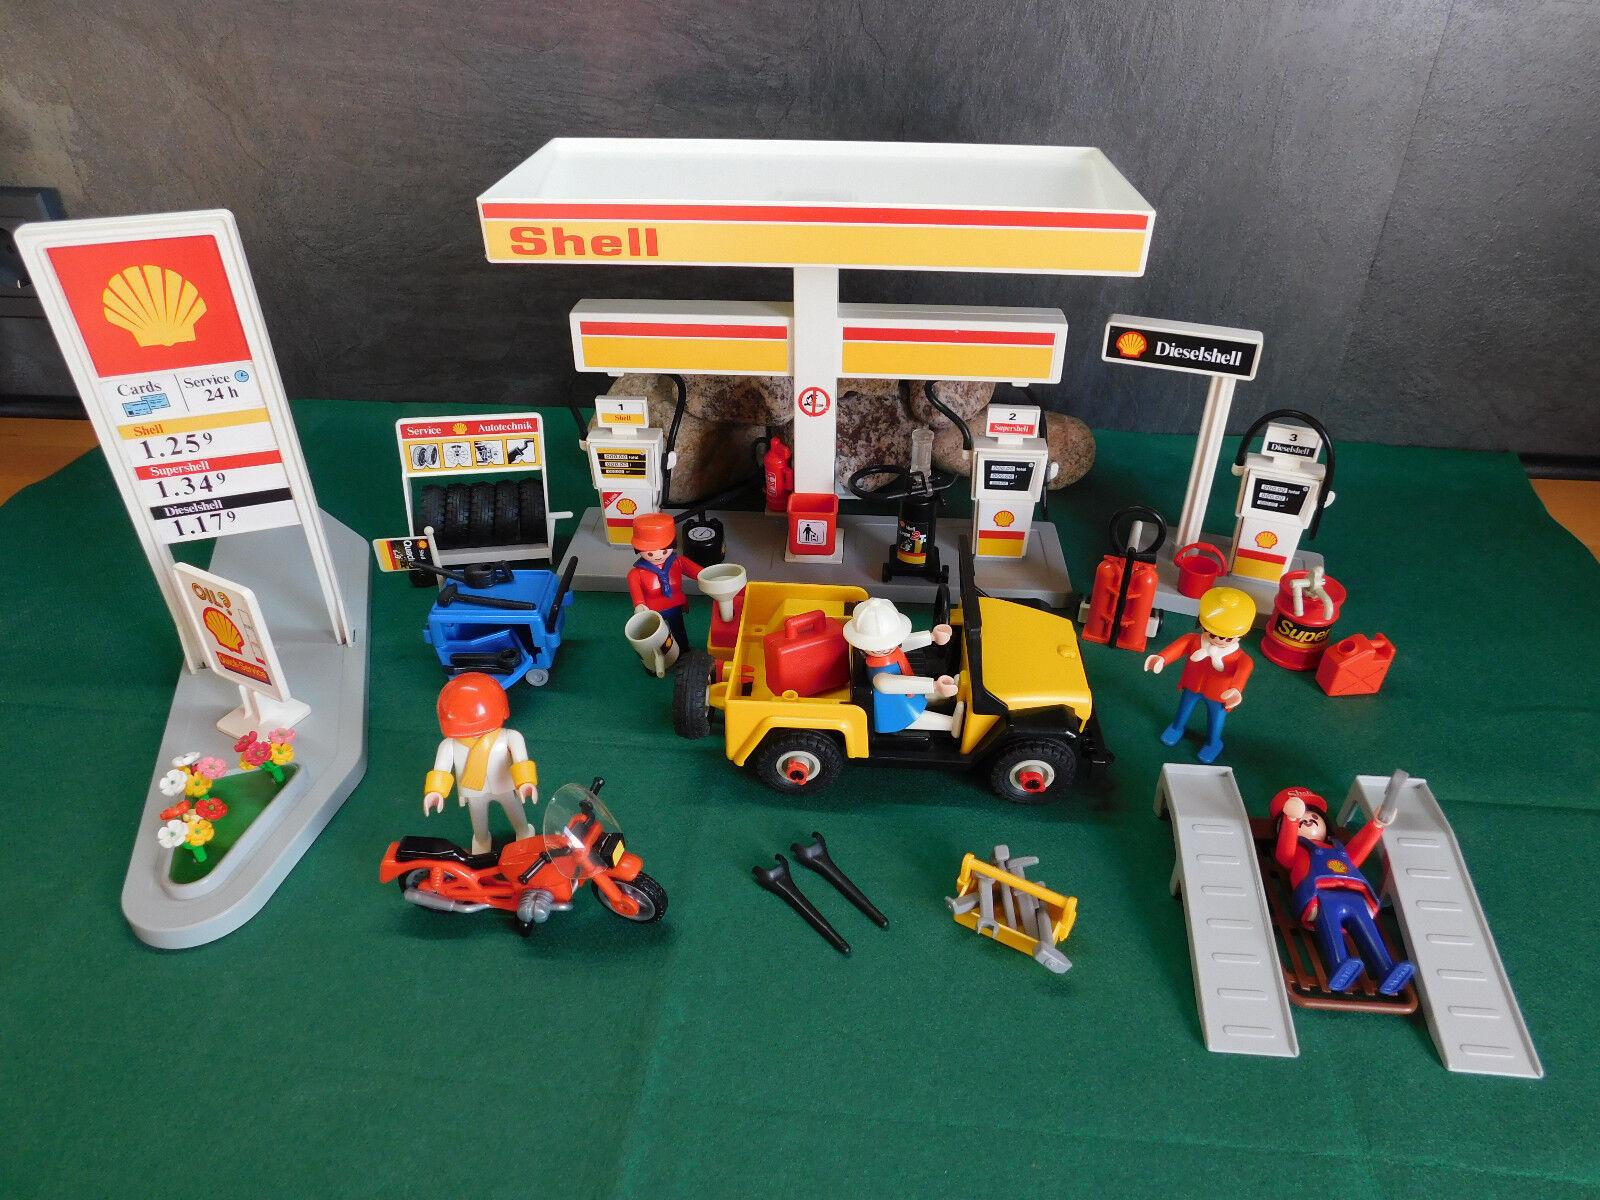 Playmobil Rarität Tankstelle Shell ähnlich 3437-A 1991 ohne OVP